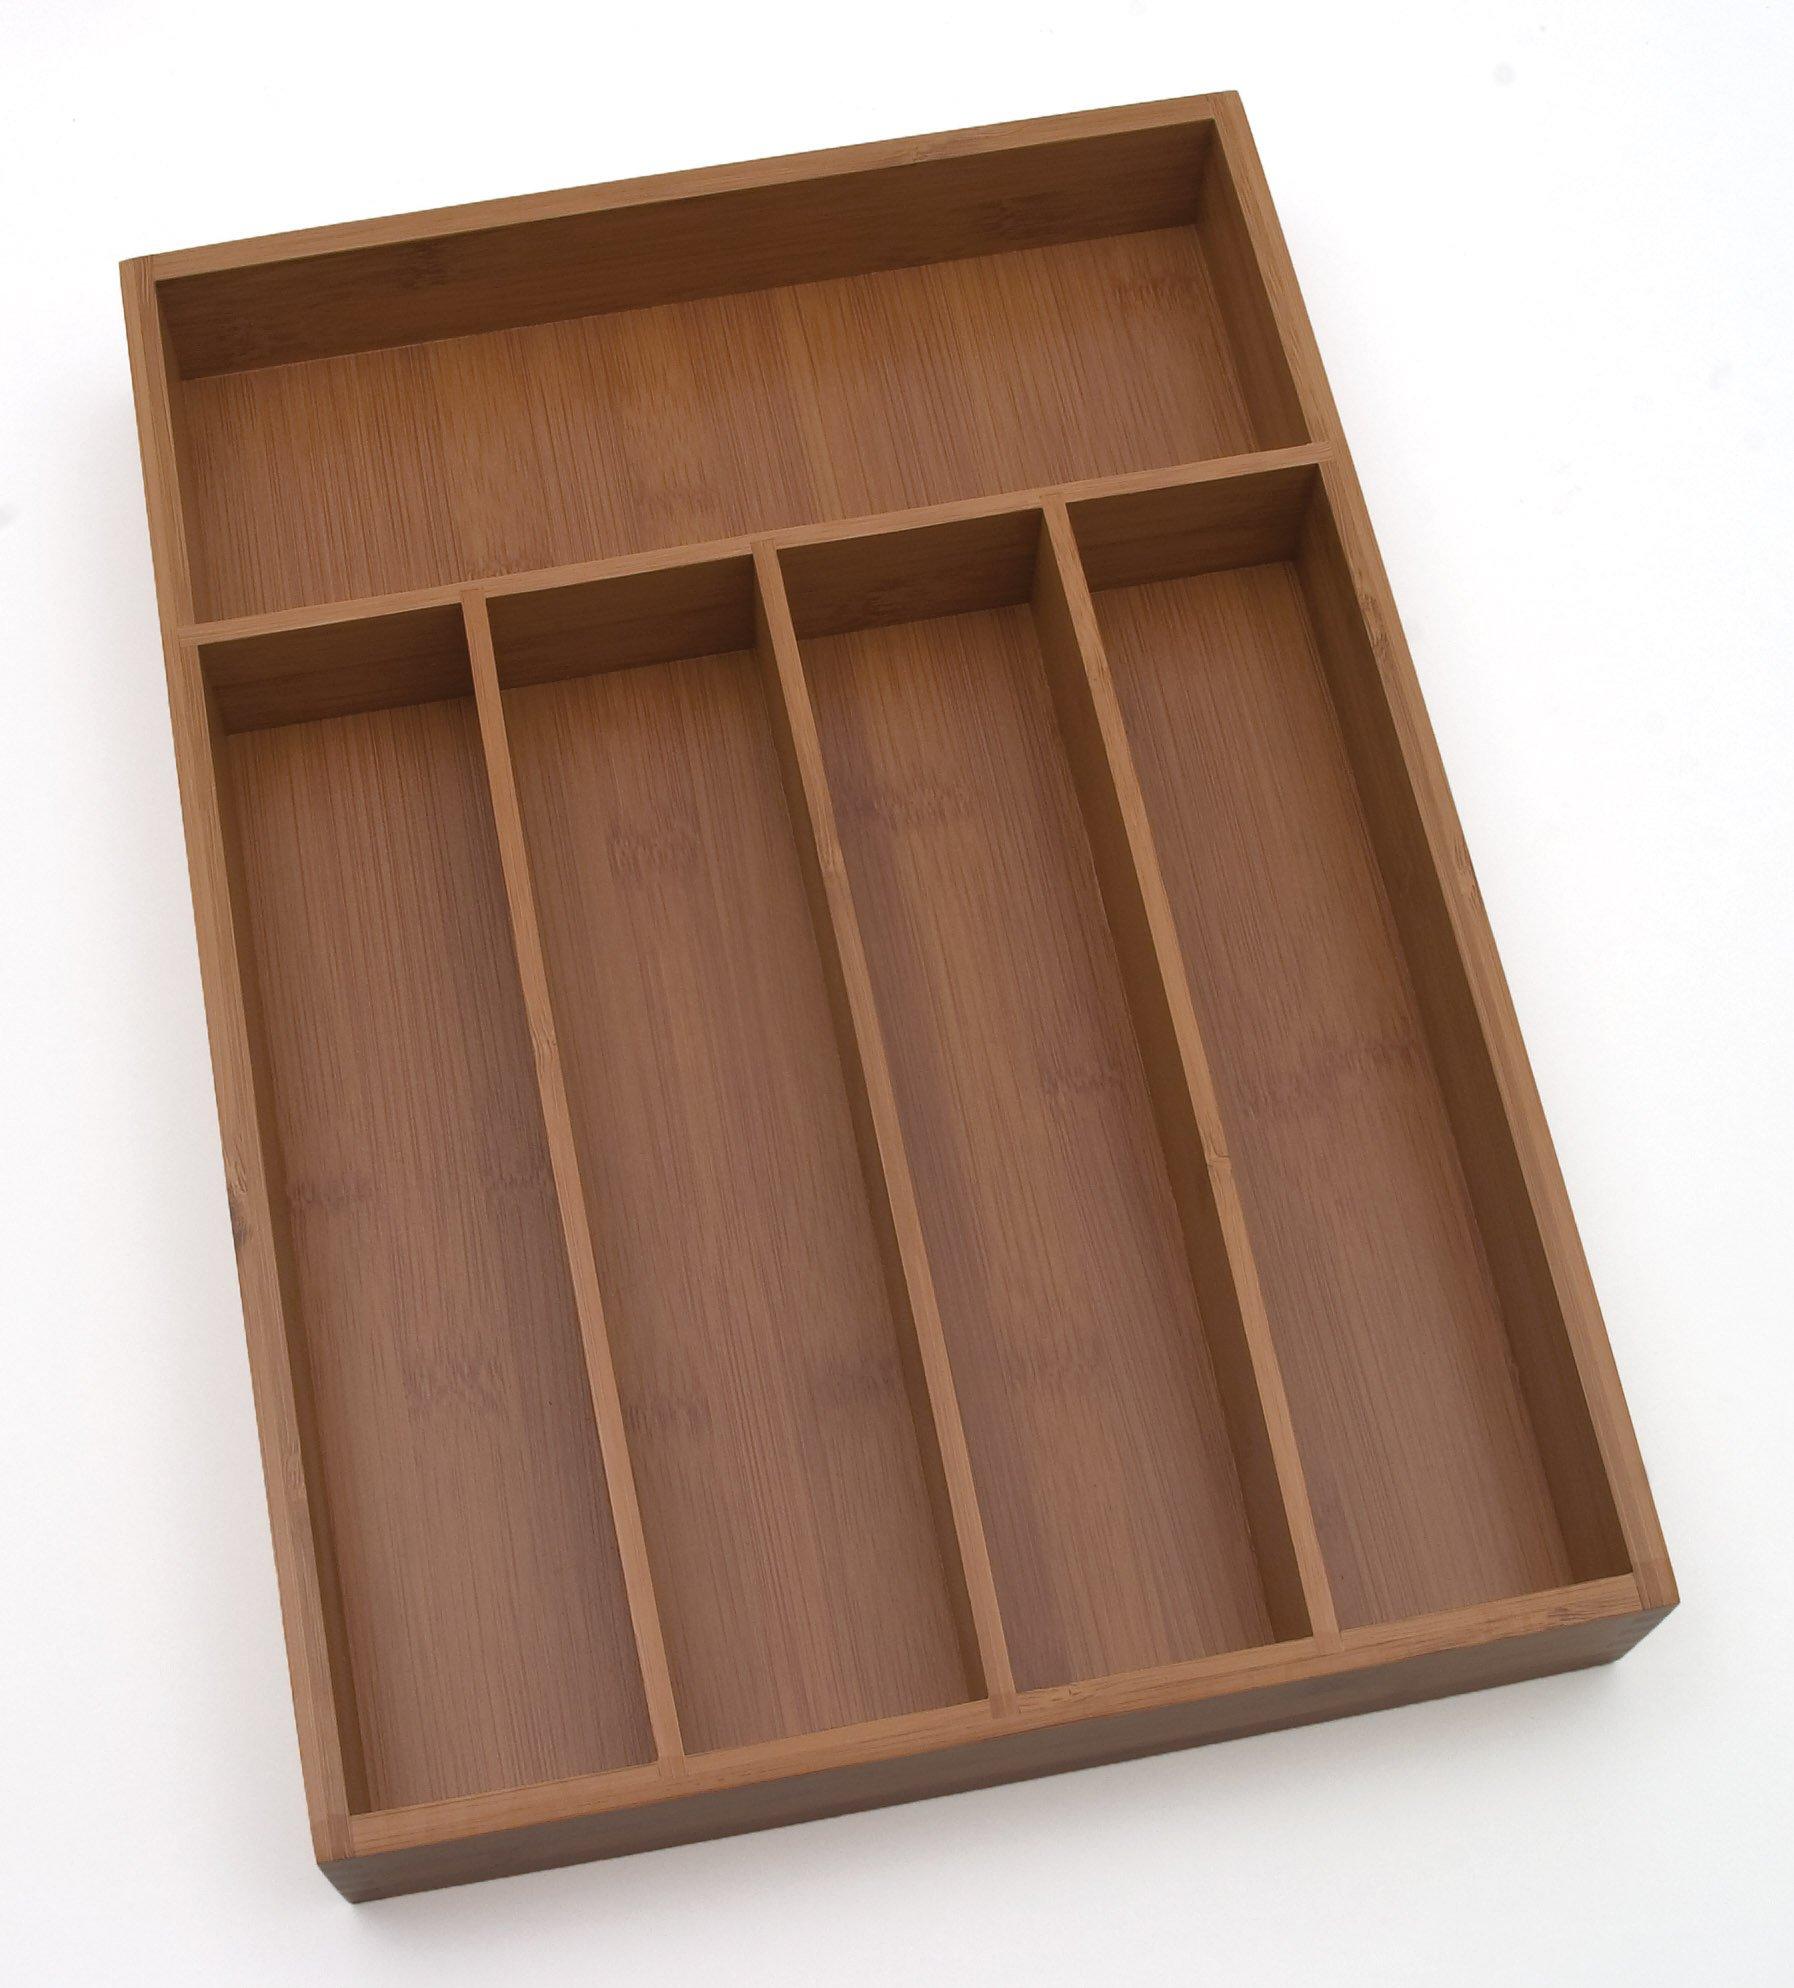 Lipper International 8876 Bamboo Wood Flatware Organizer with 5 Compartments, 10-1/4'' x 14'' x 2''